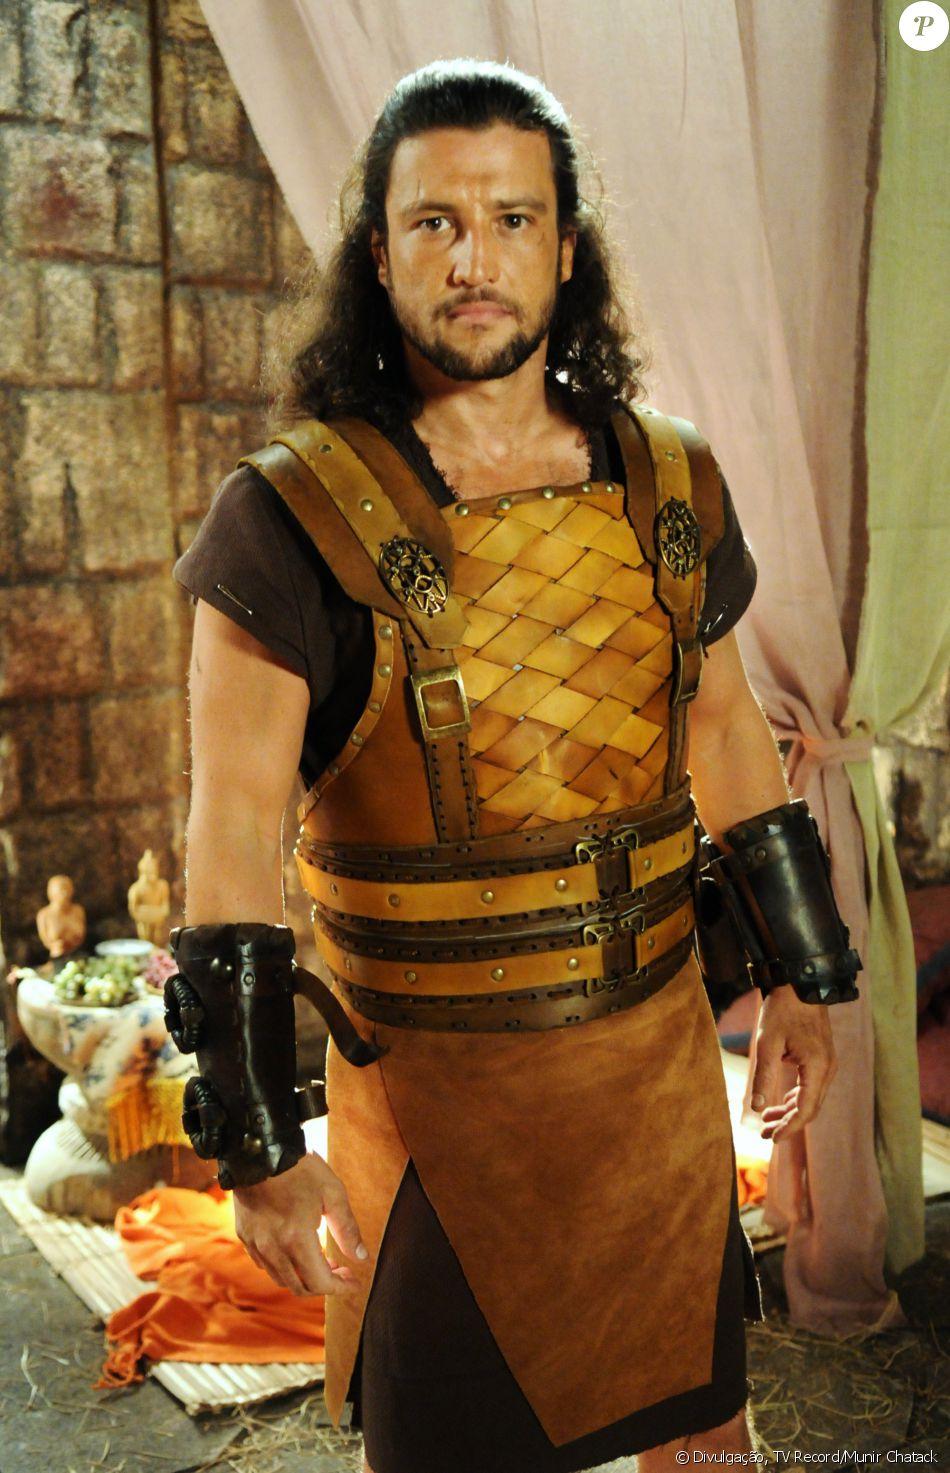 Maquir (Alexandre Slaviero) é o soldado de temperamento rebelde que engravida Livana (Letícia Medina), na novela 'A Terra Prometida'